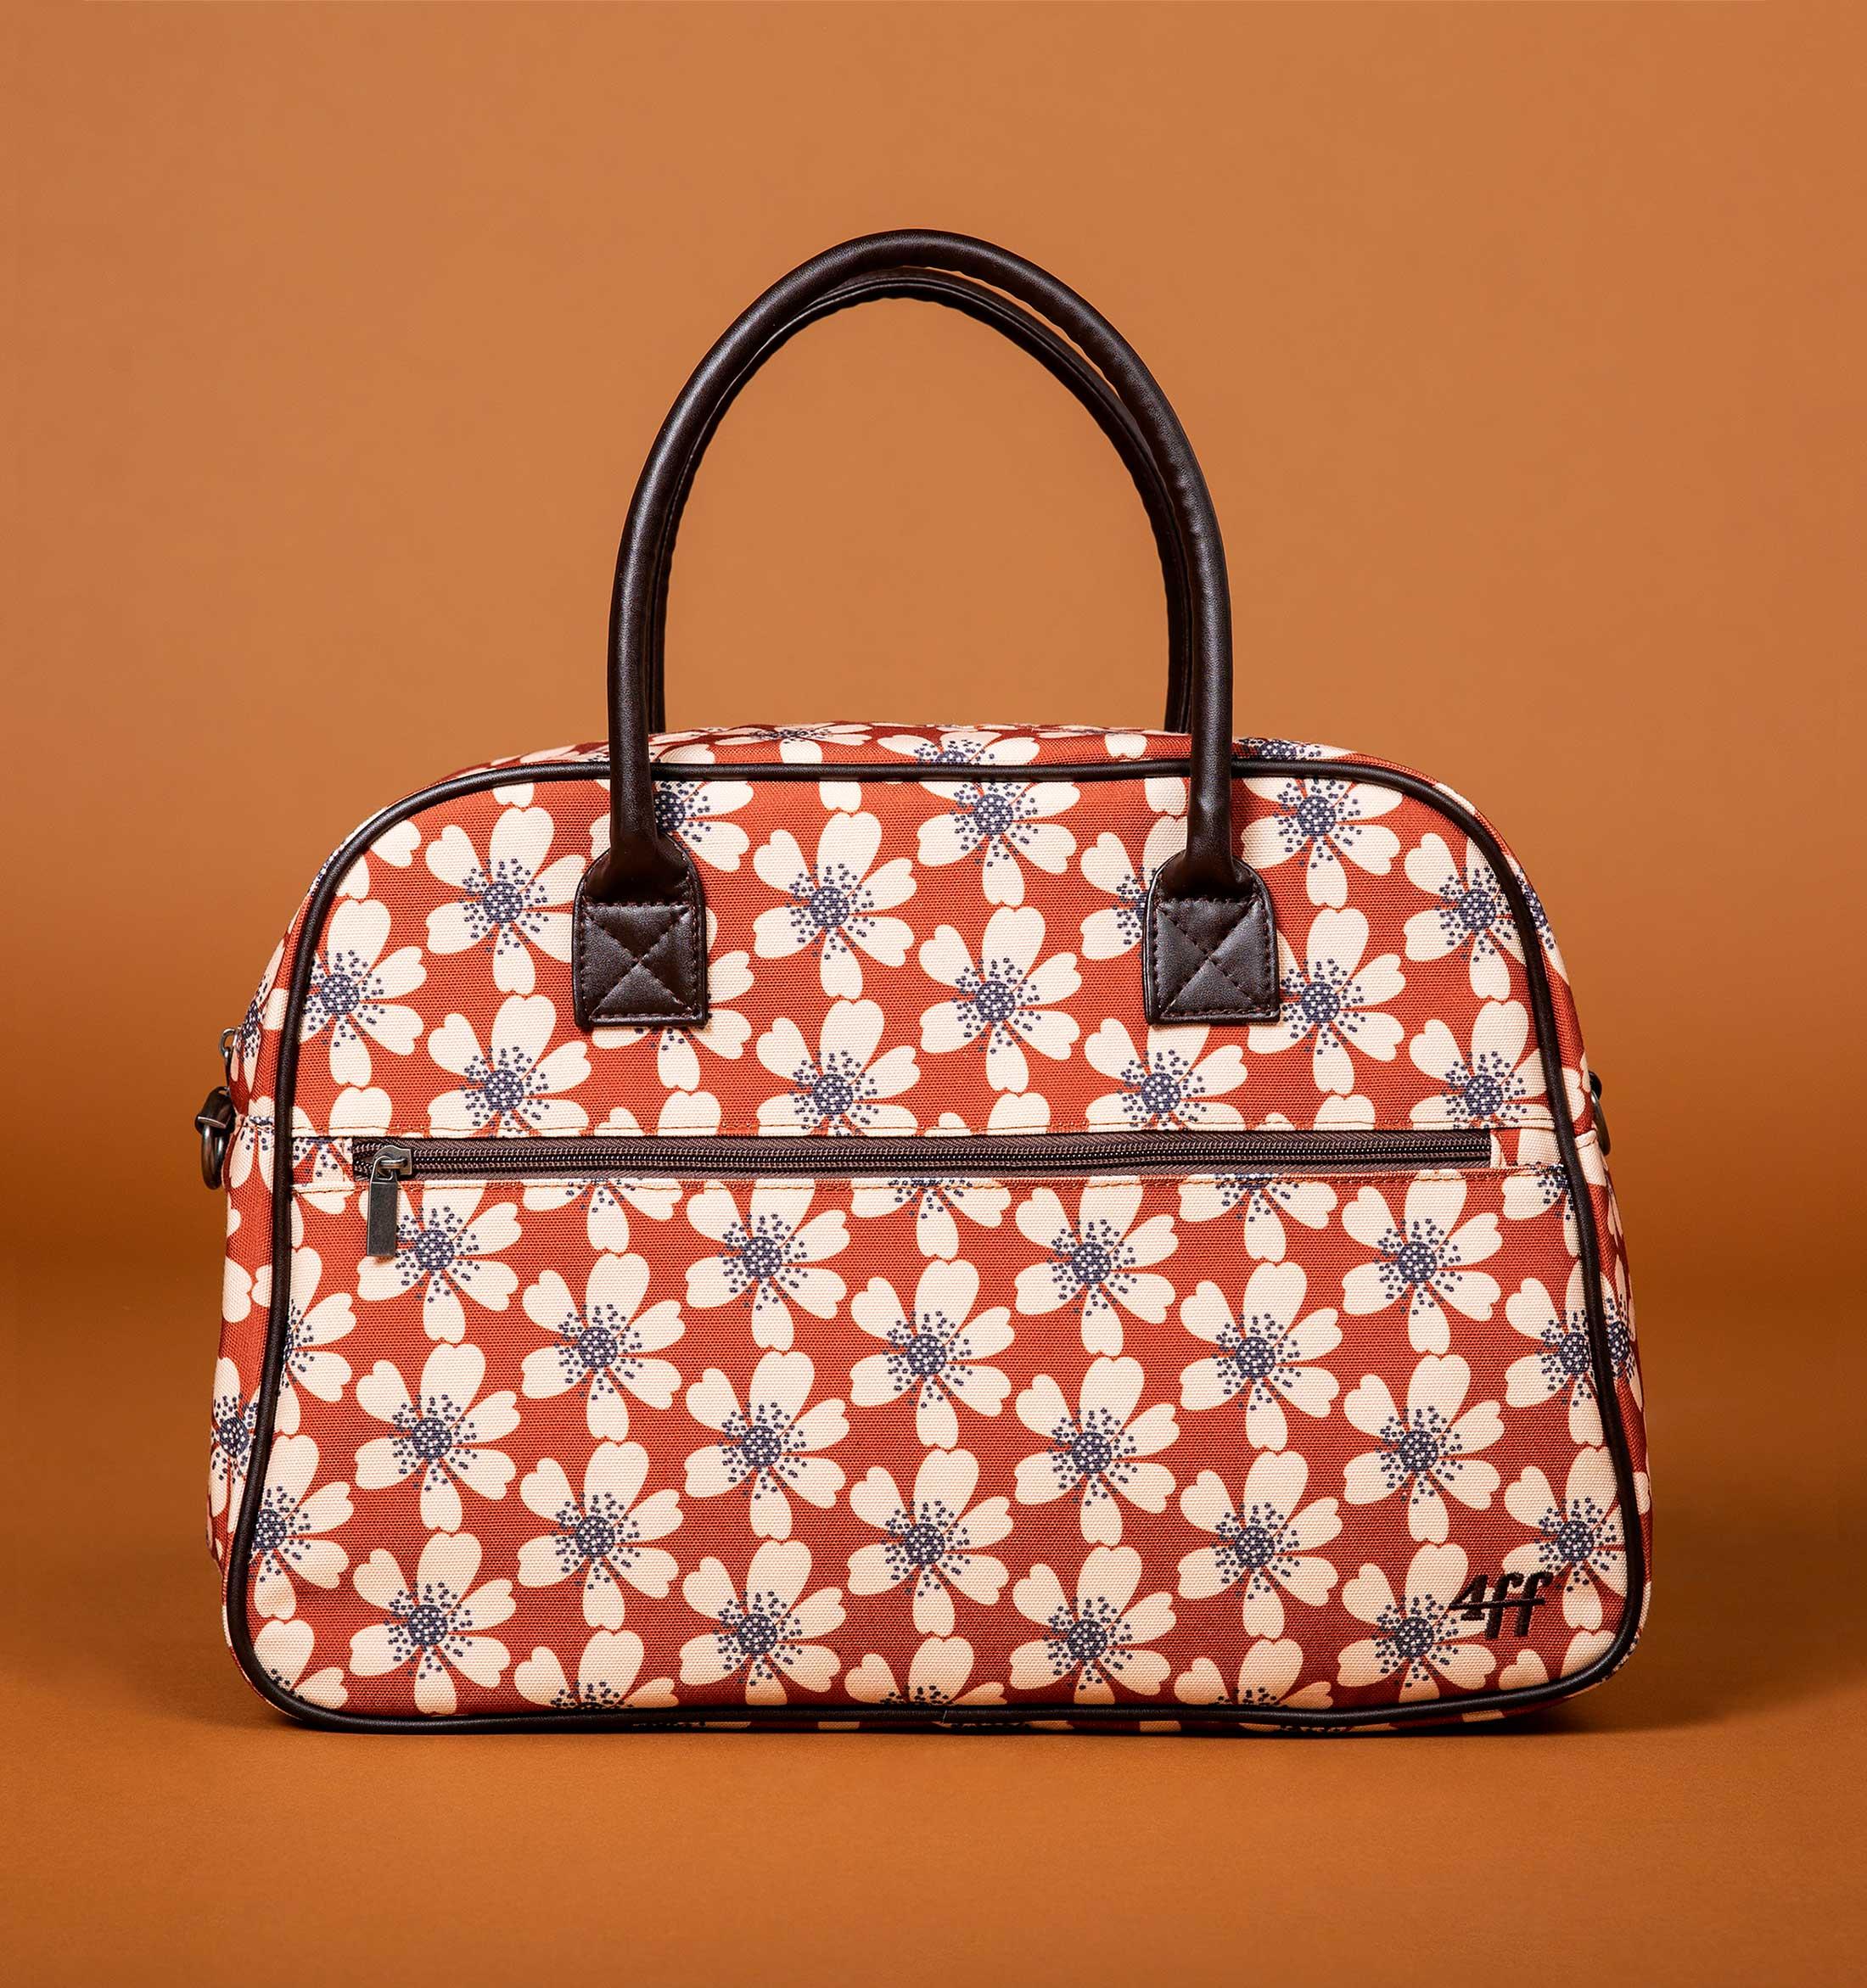 Limited Edition Bag - 18W5752